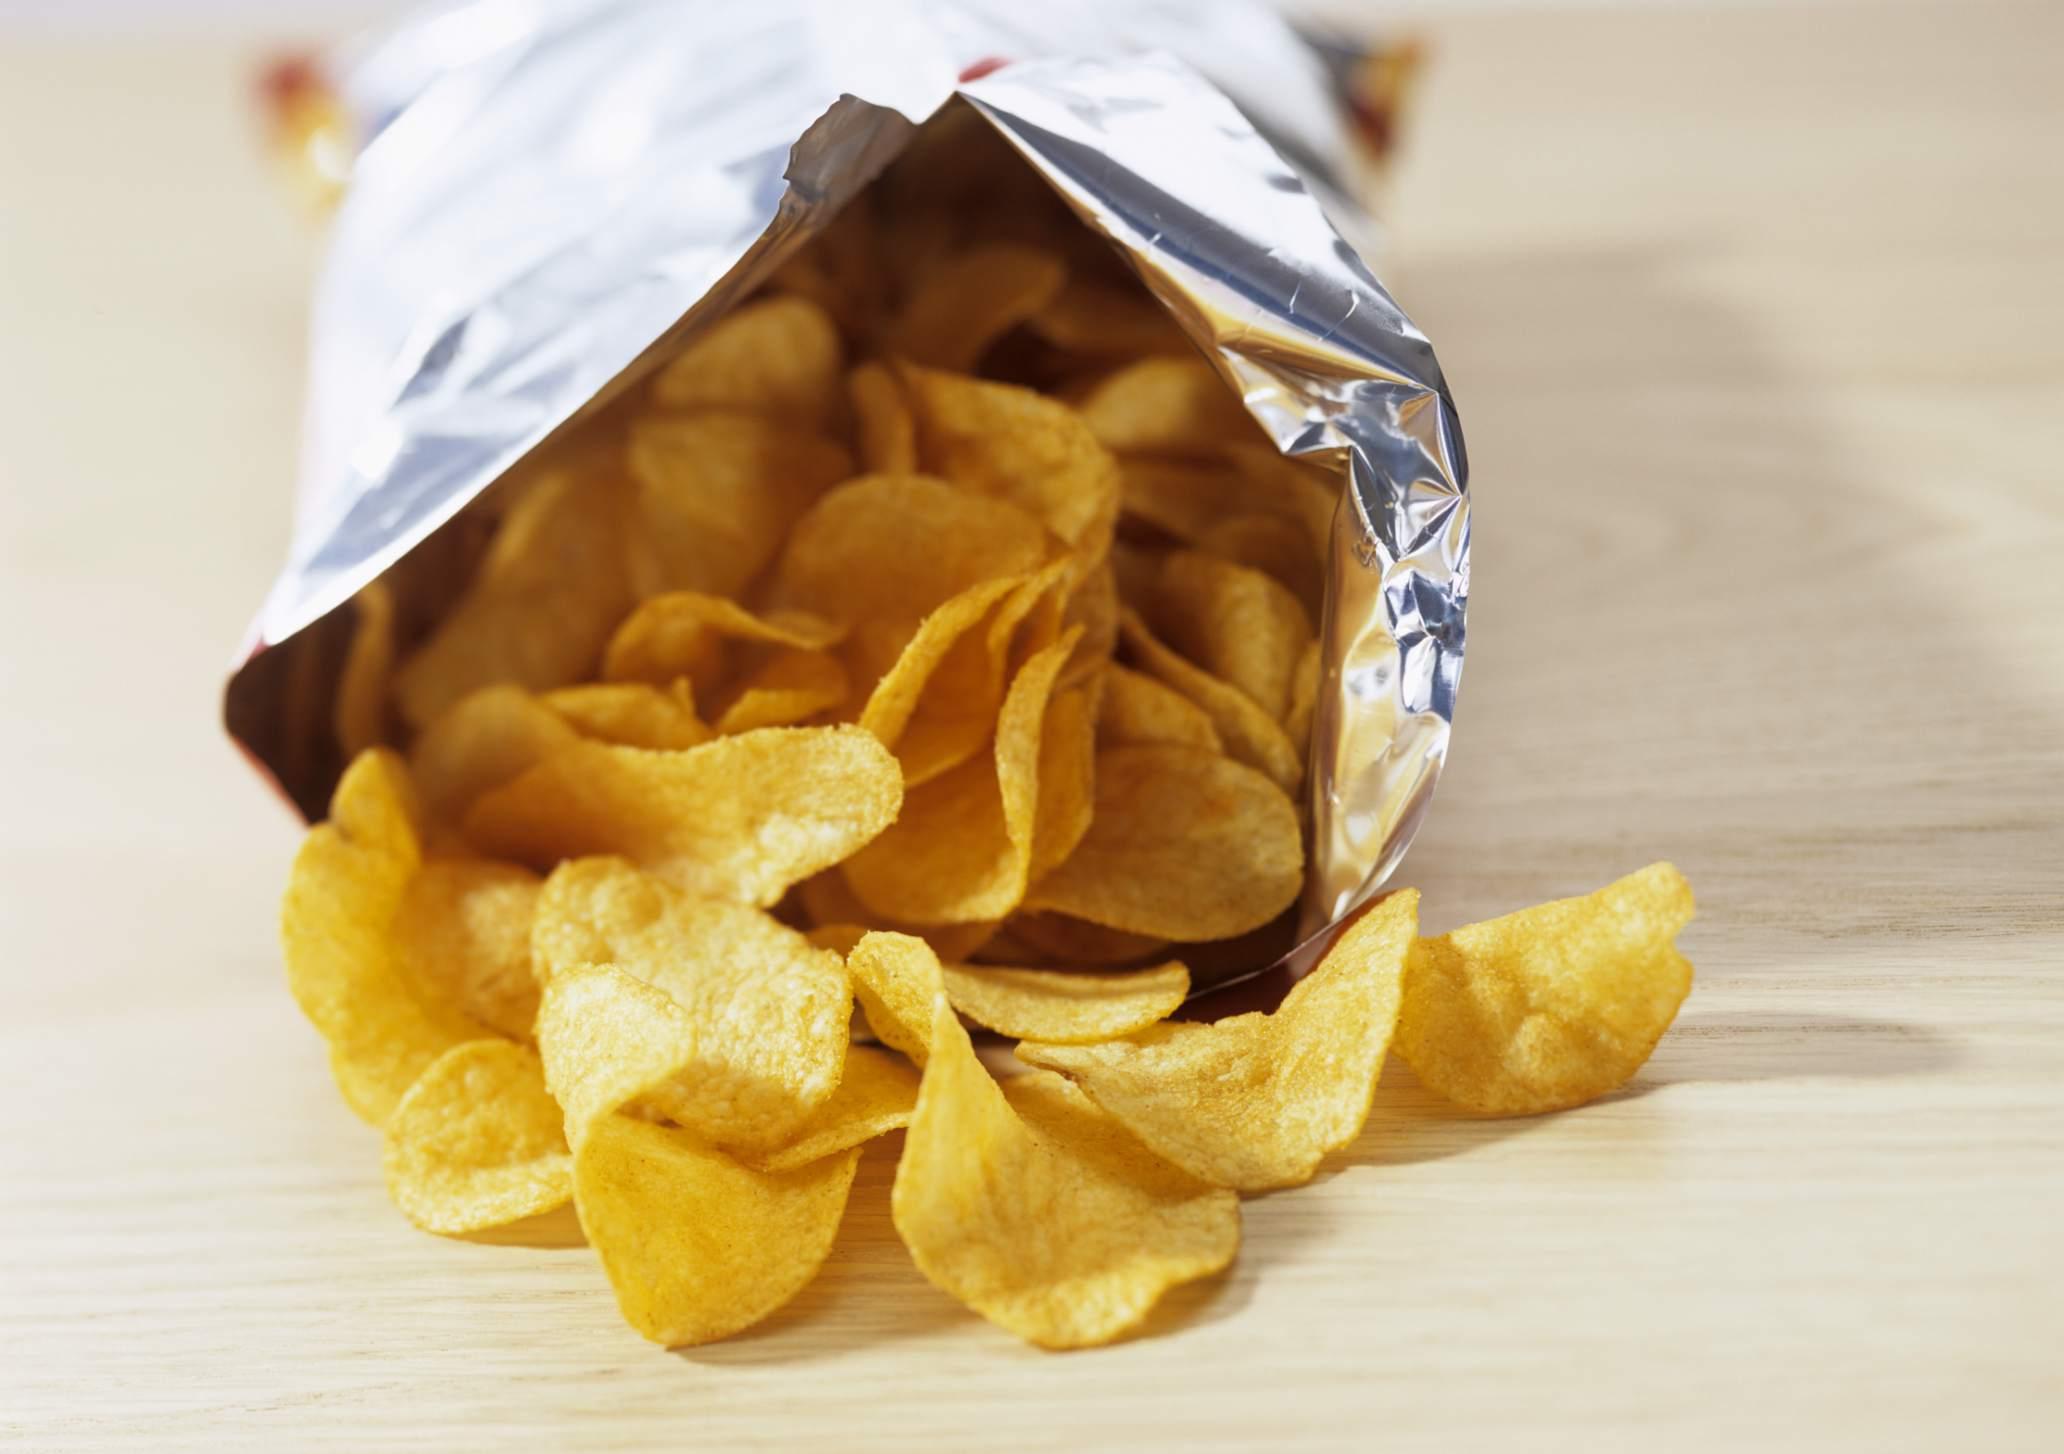 bolsa abierta de patatas fritas